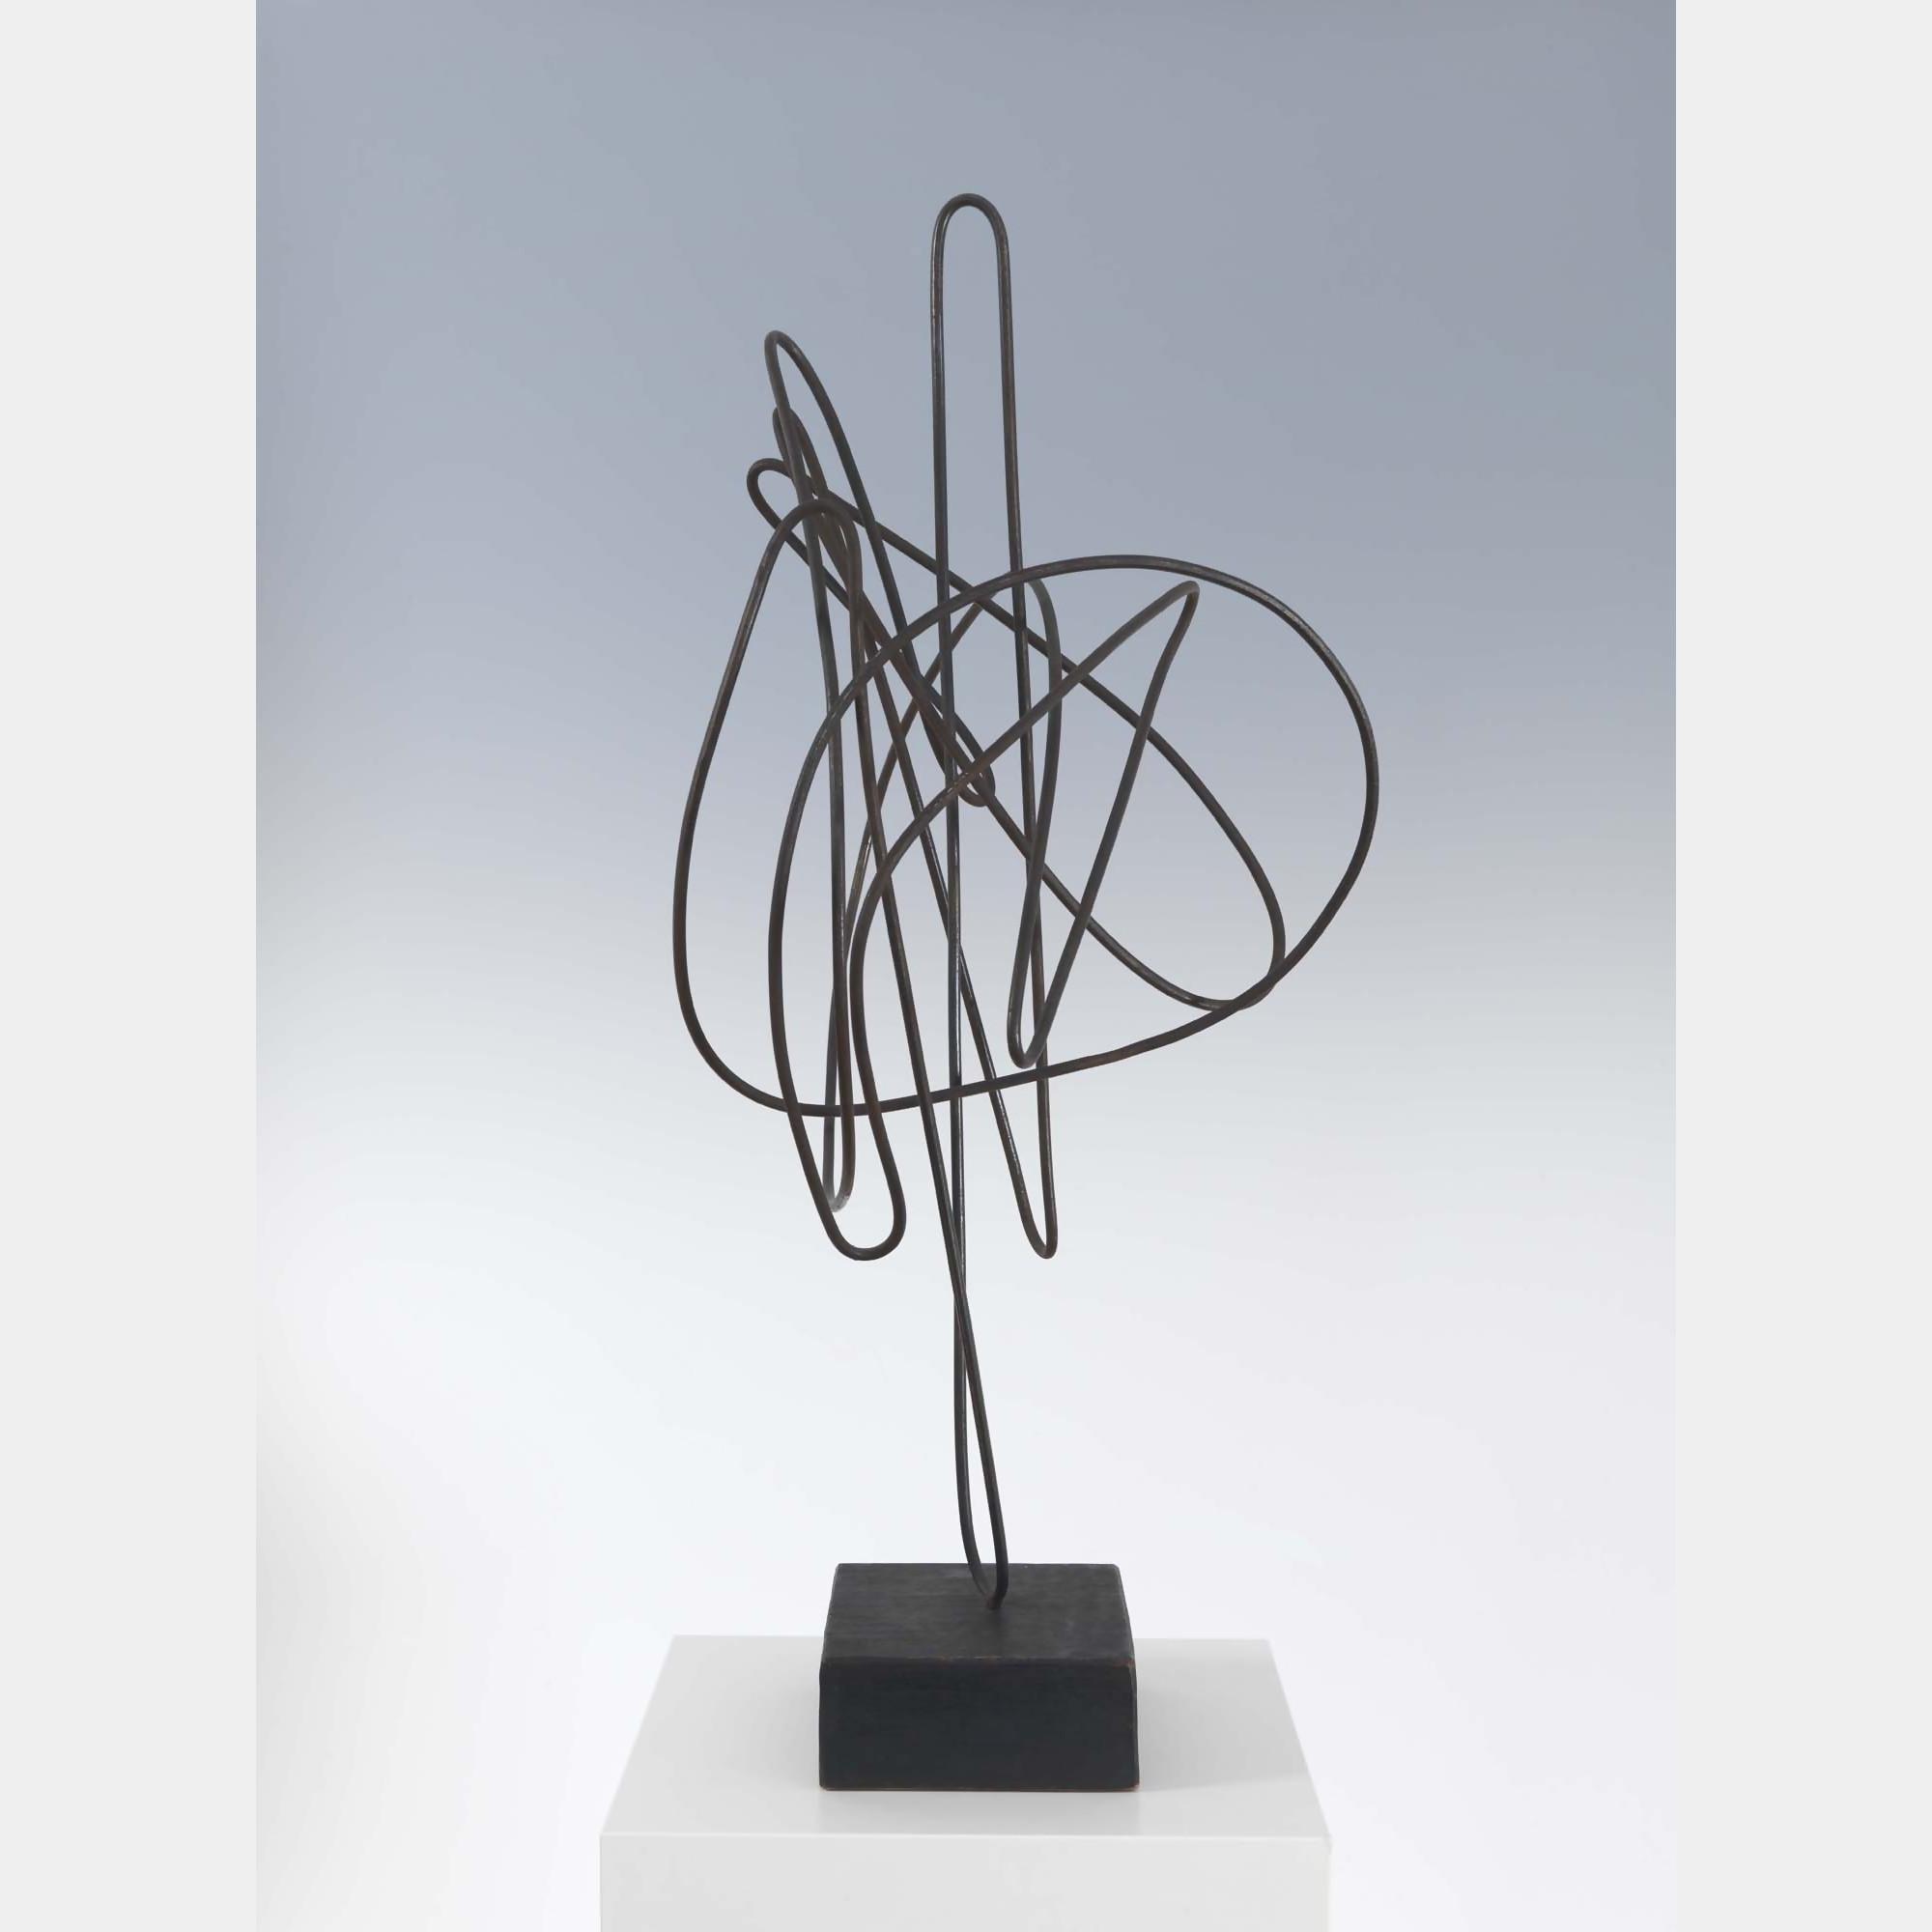 Hans Uhlmann | Draht-Plastik (wire sculpture) | Art Basel